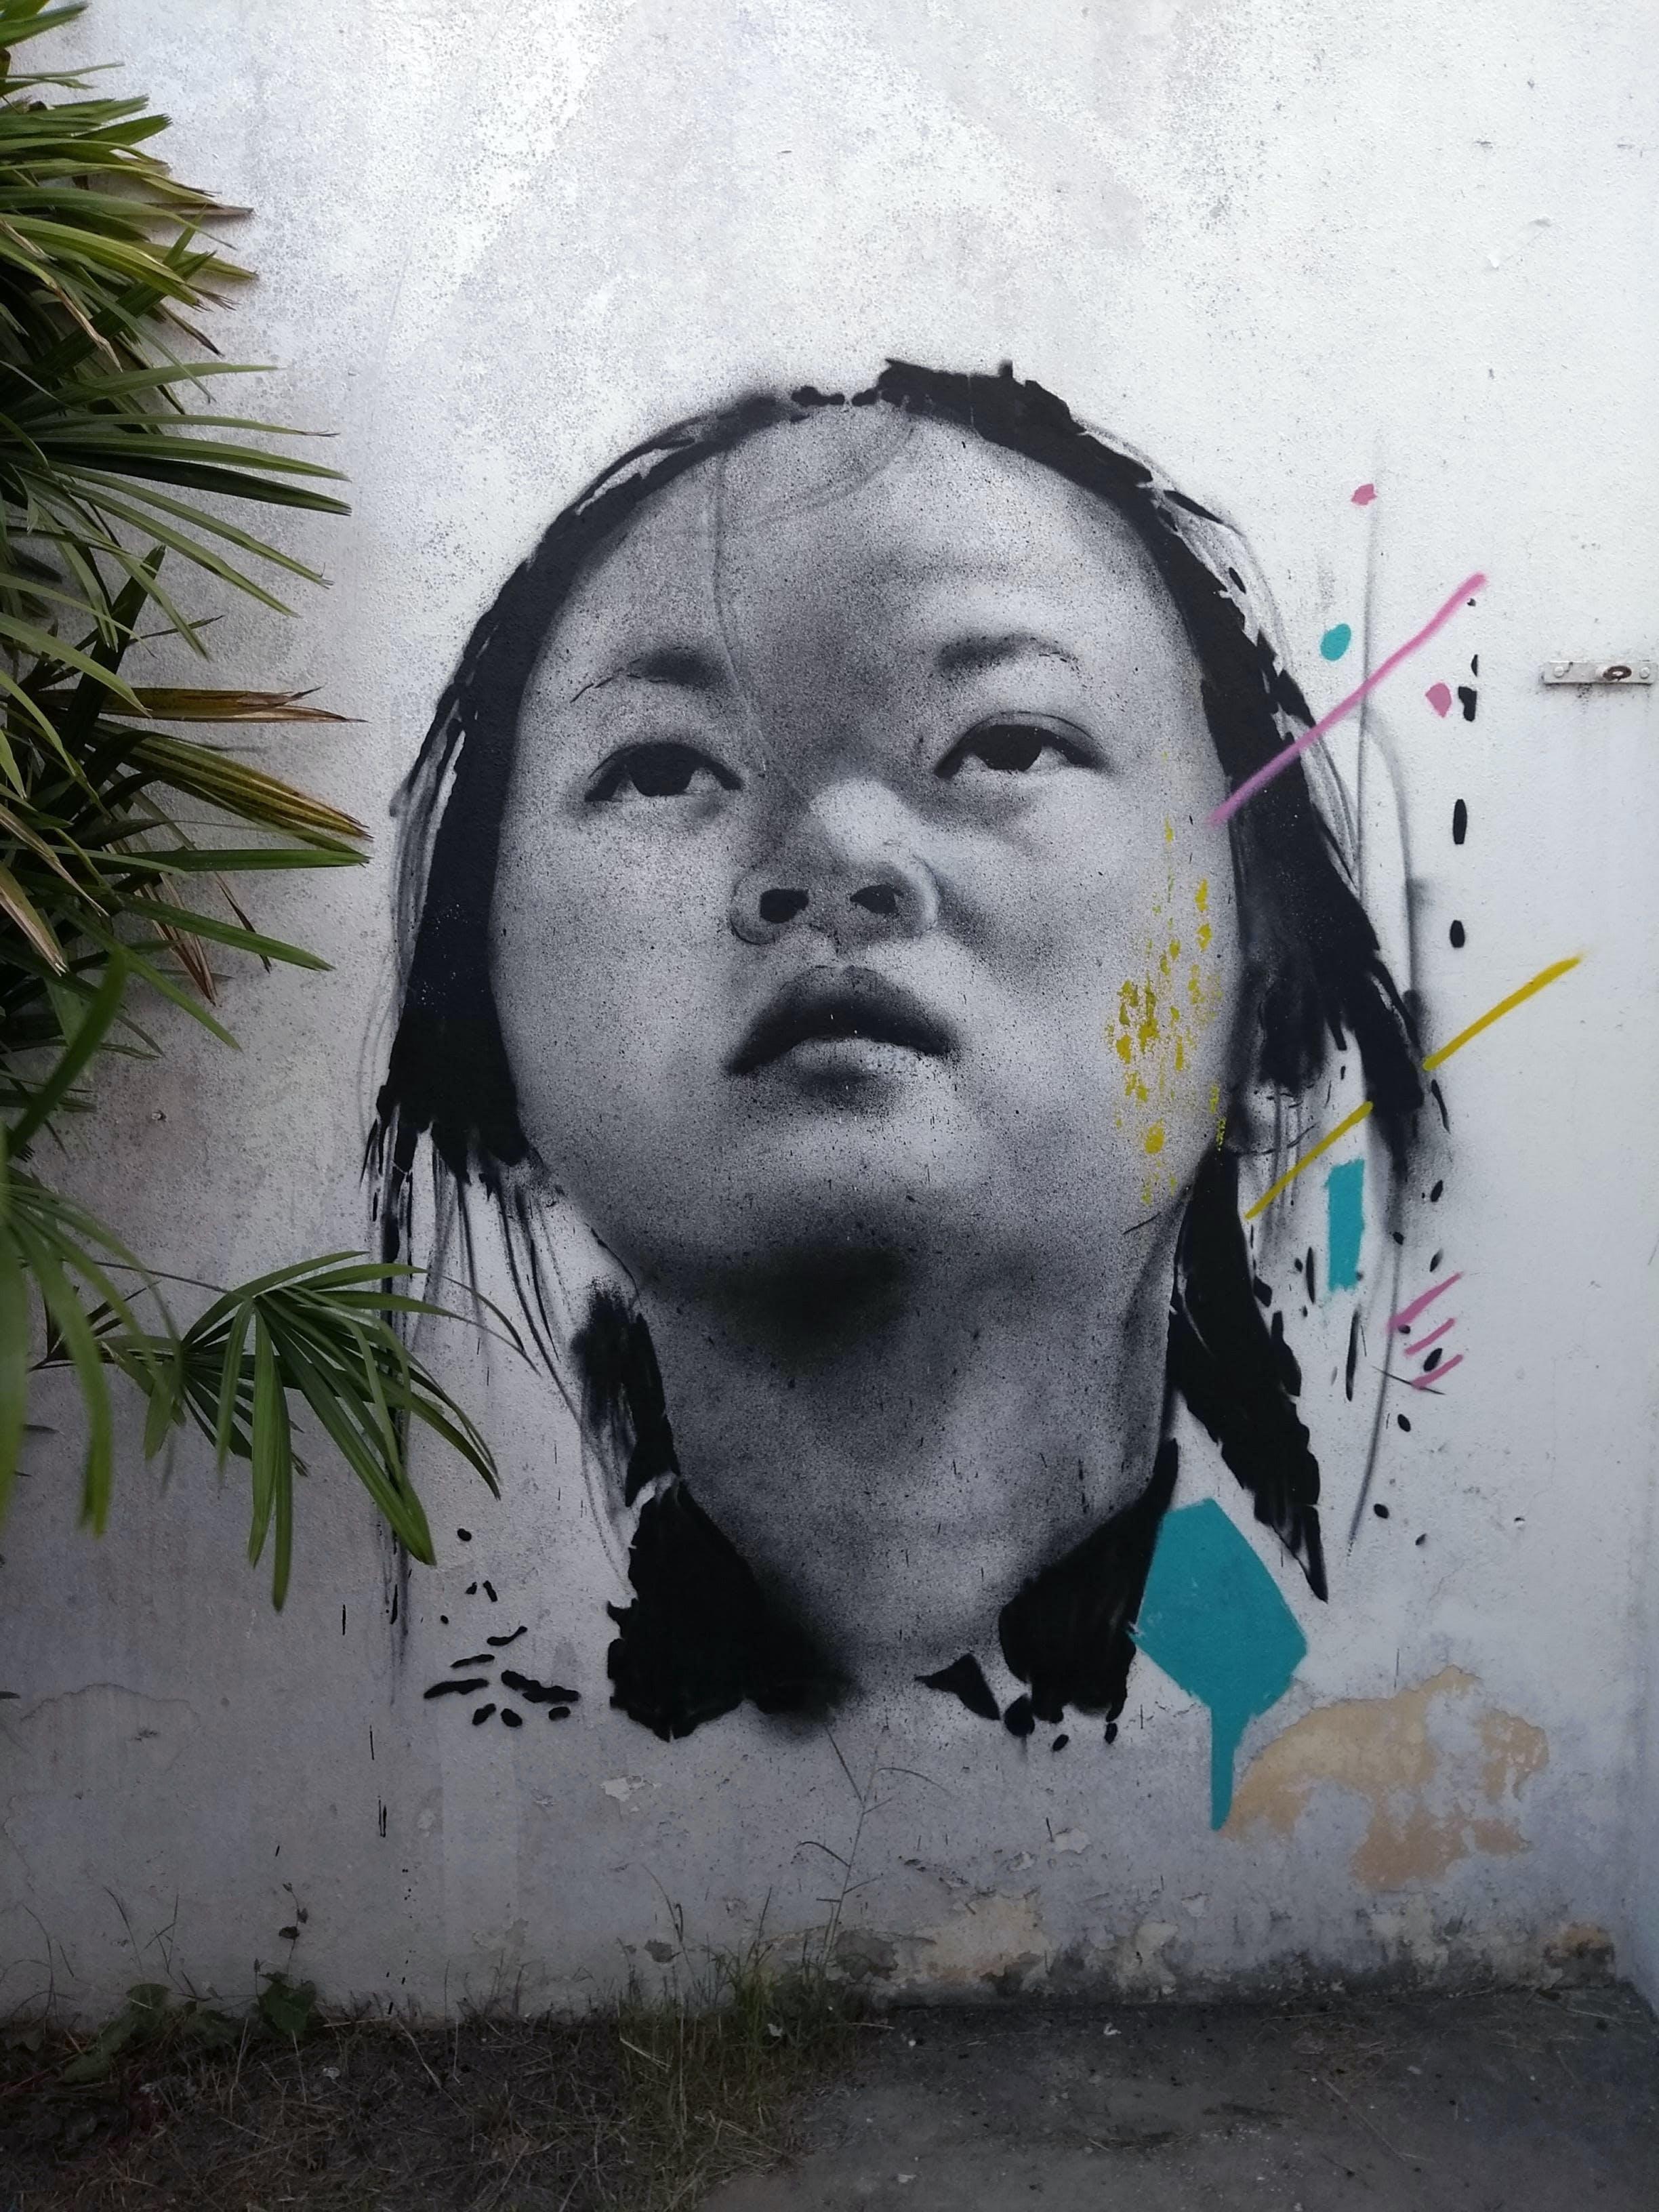 Kostenloses Stock Foto zu gesicht, gesichtsausdruck, graffiti, grüne blätter